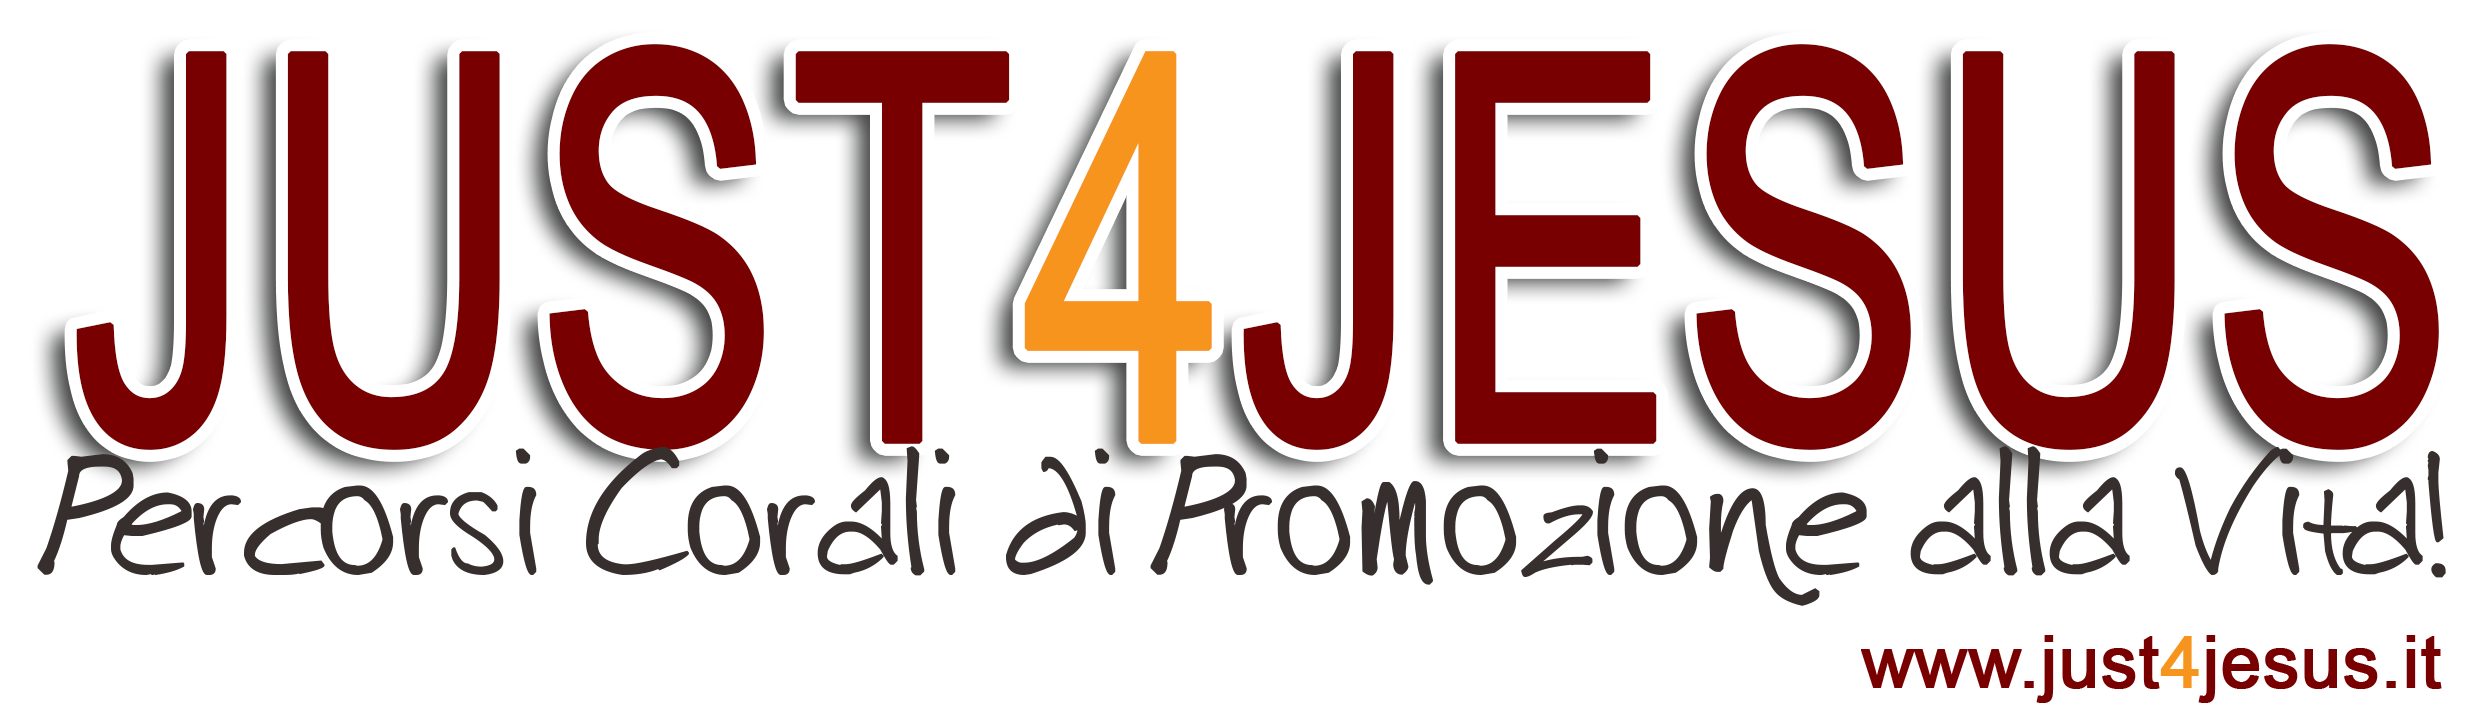 Logo Just4Jesus